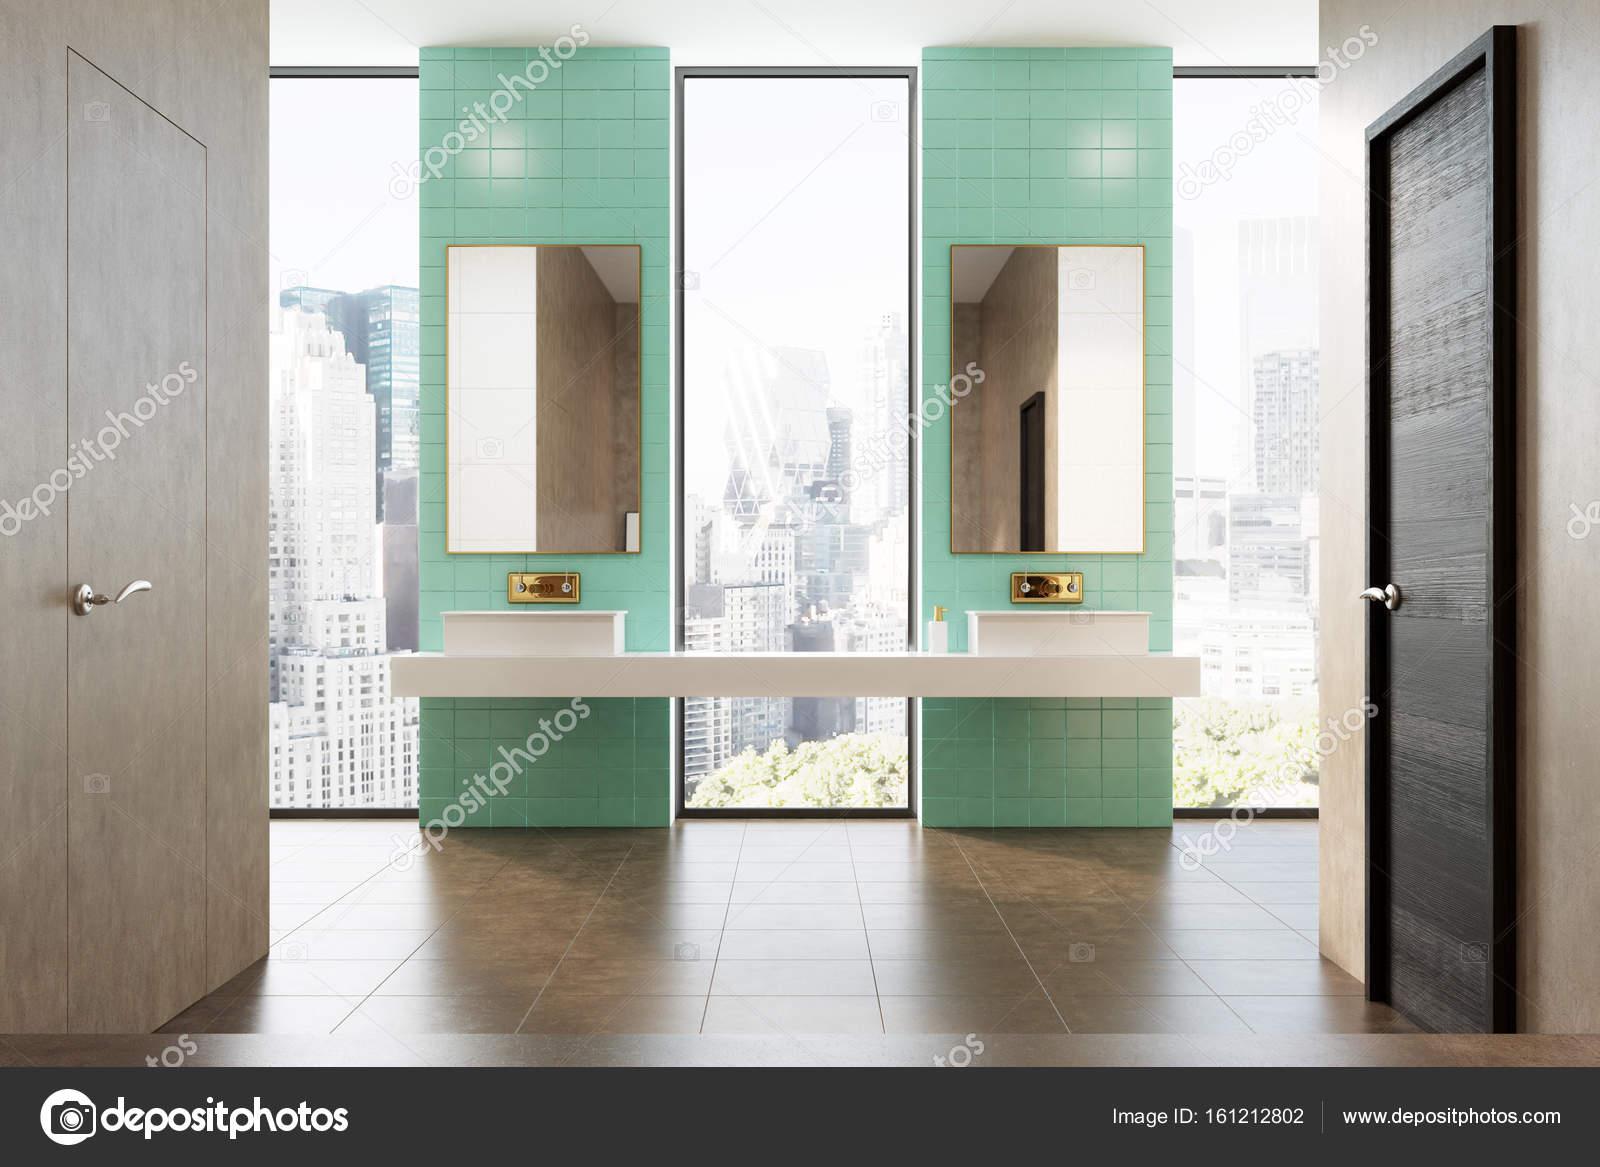 https://st3.depositphotos.com/2673929/16121/i/1600/depositphotos_161212802-stockafbeelding-groene-badkamer-dubbele-wastafel.jpg